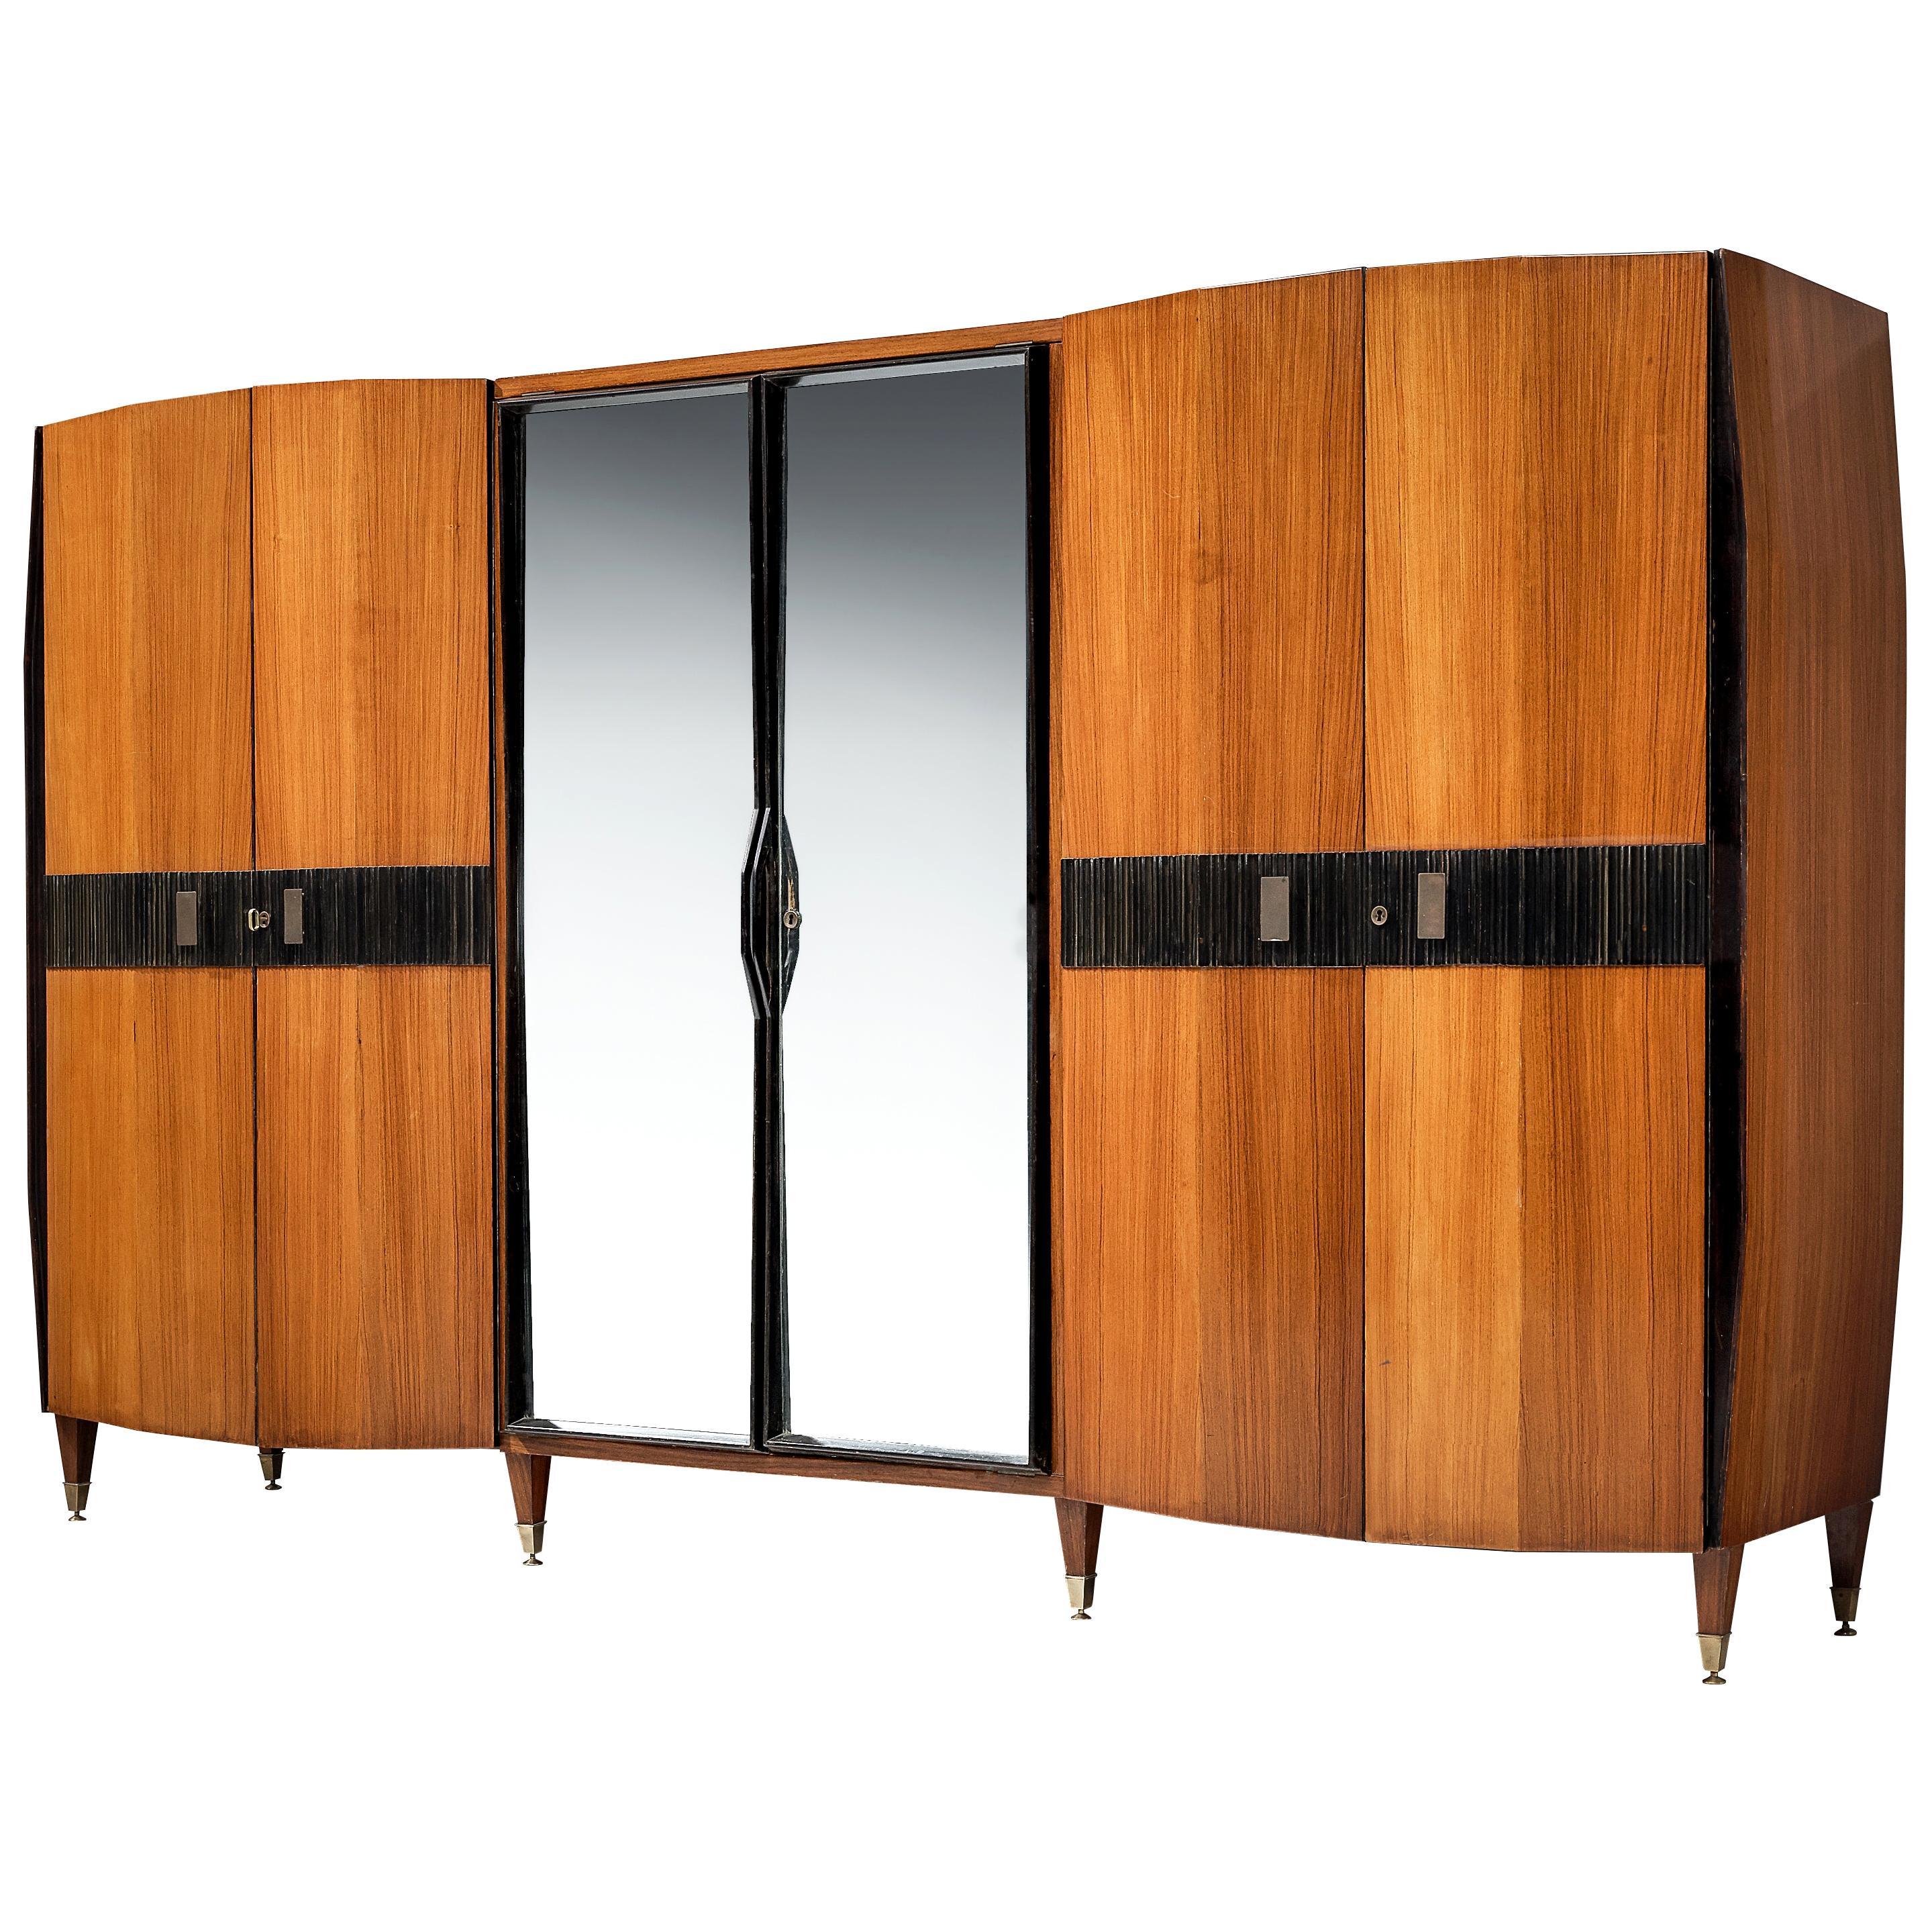 Large Italian Wardrobe in Walnut with Mirrored Doors